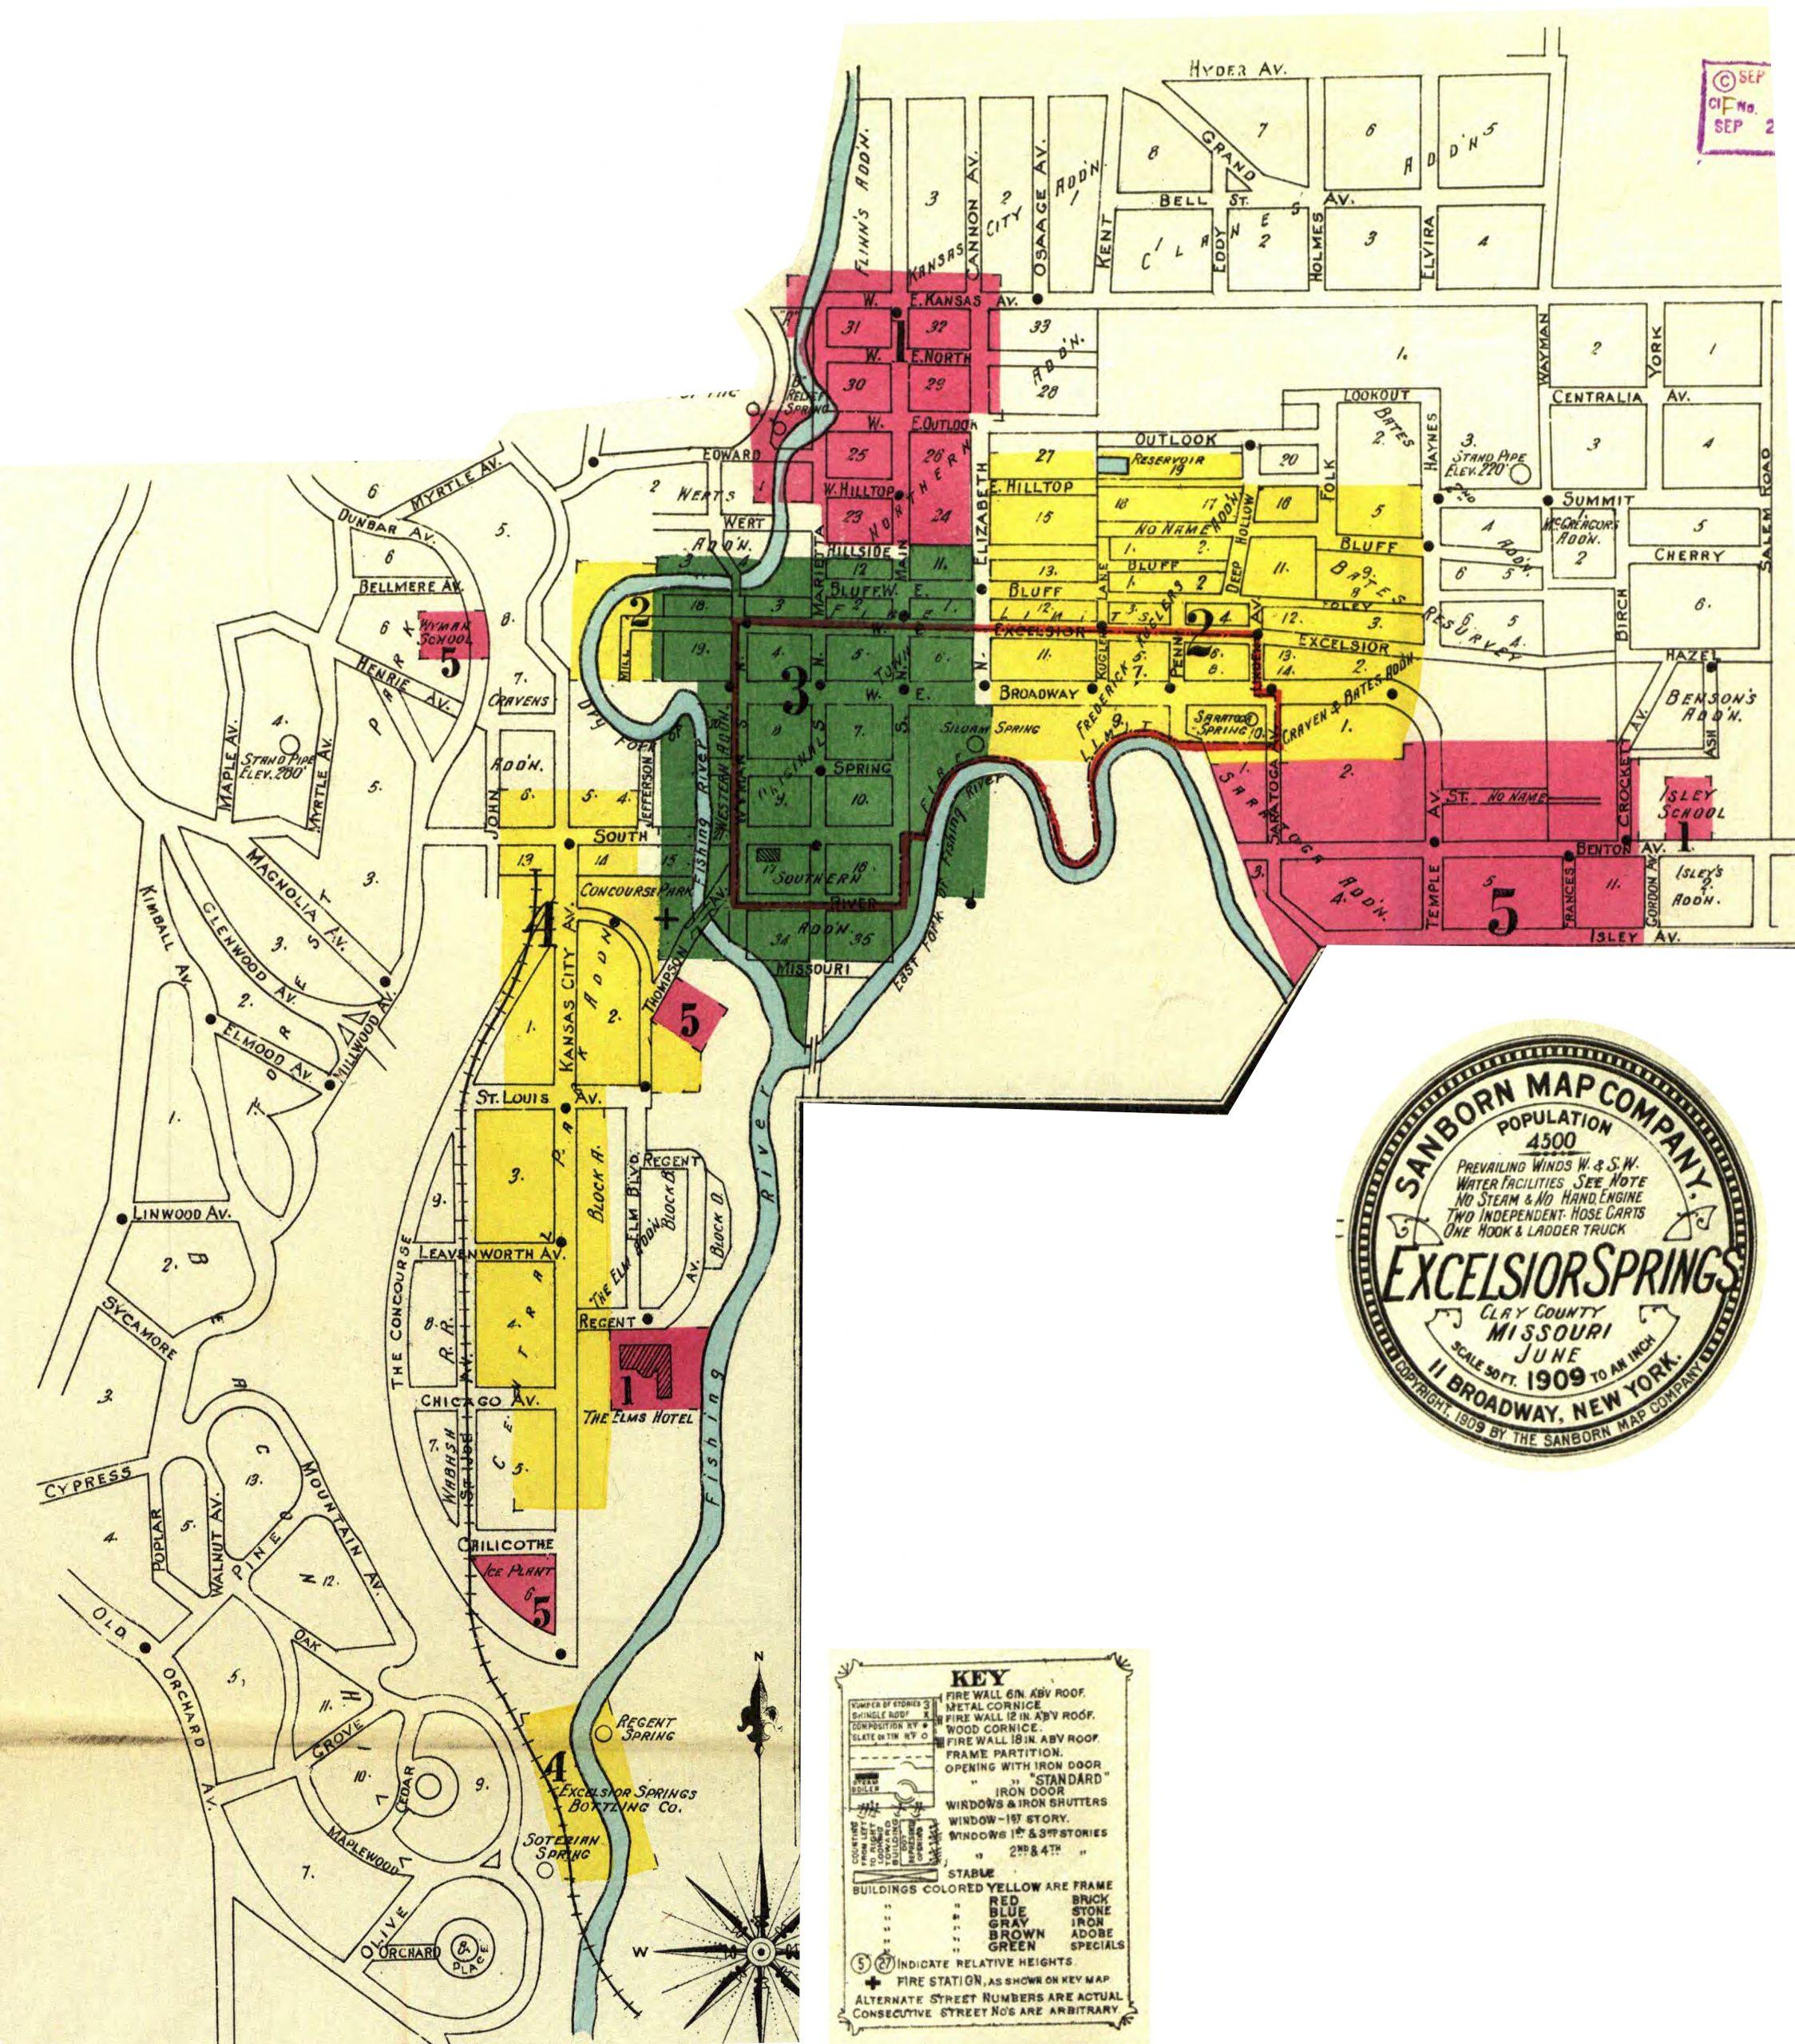 Sanborn Maps – 1909